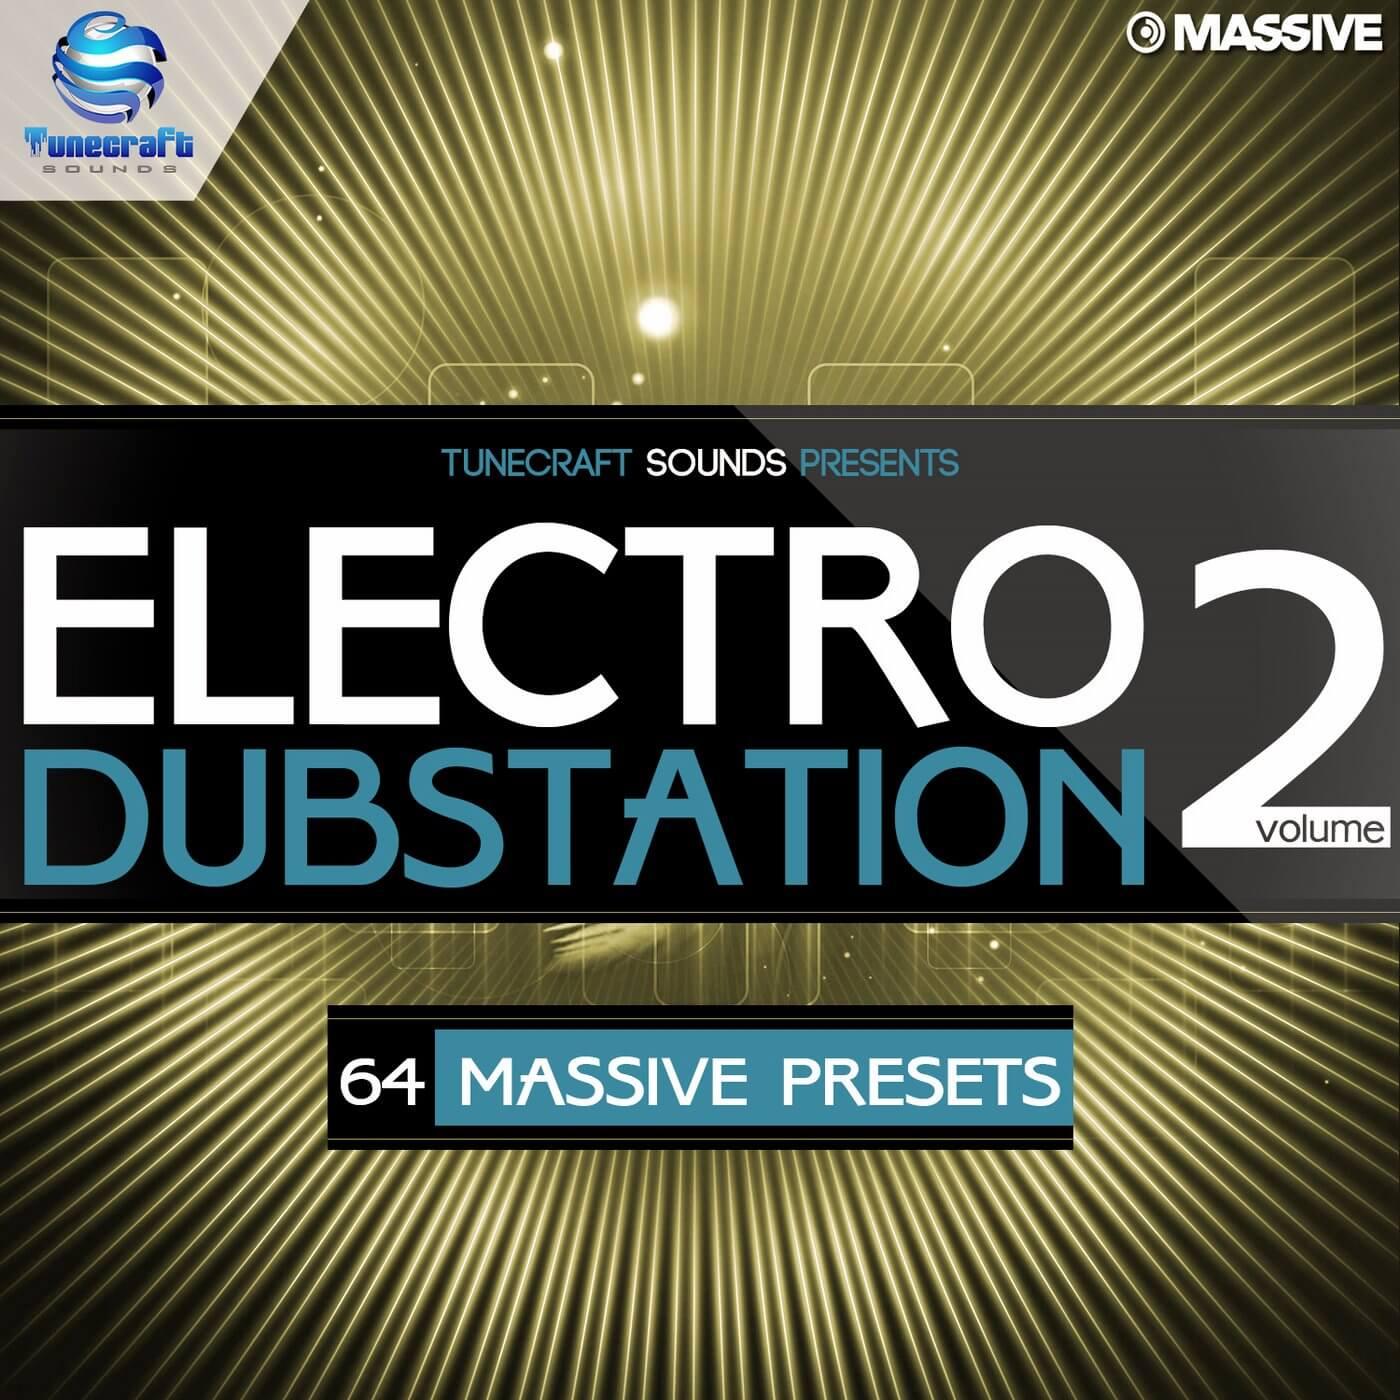 Electro Dubstation Vol 2